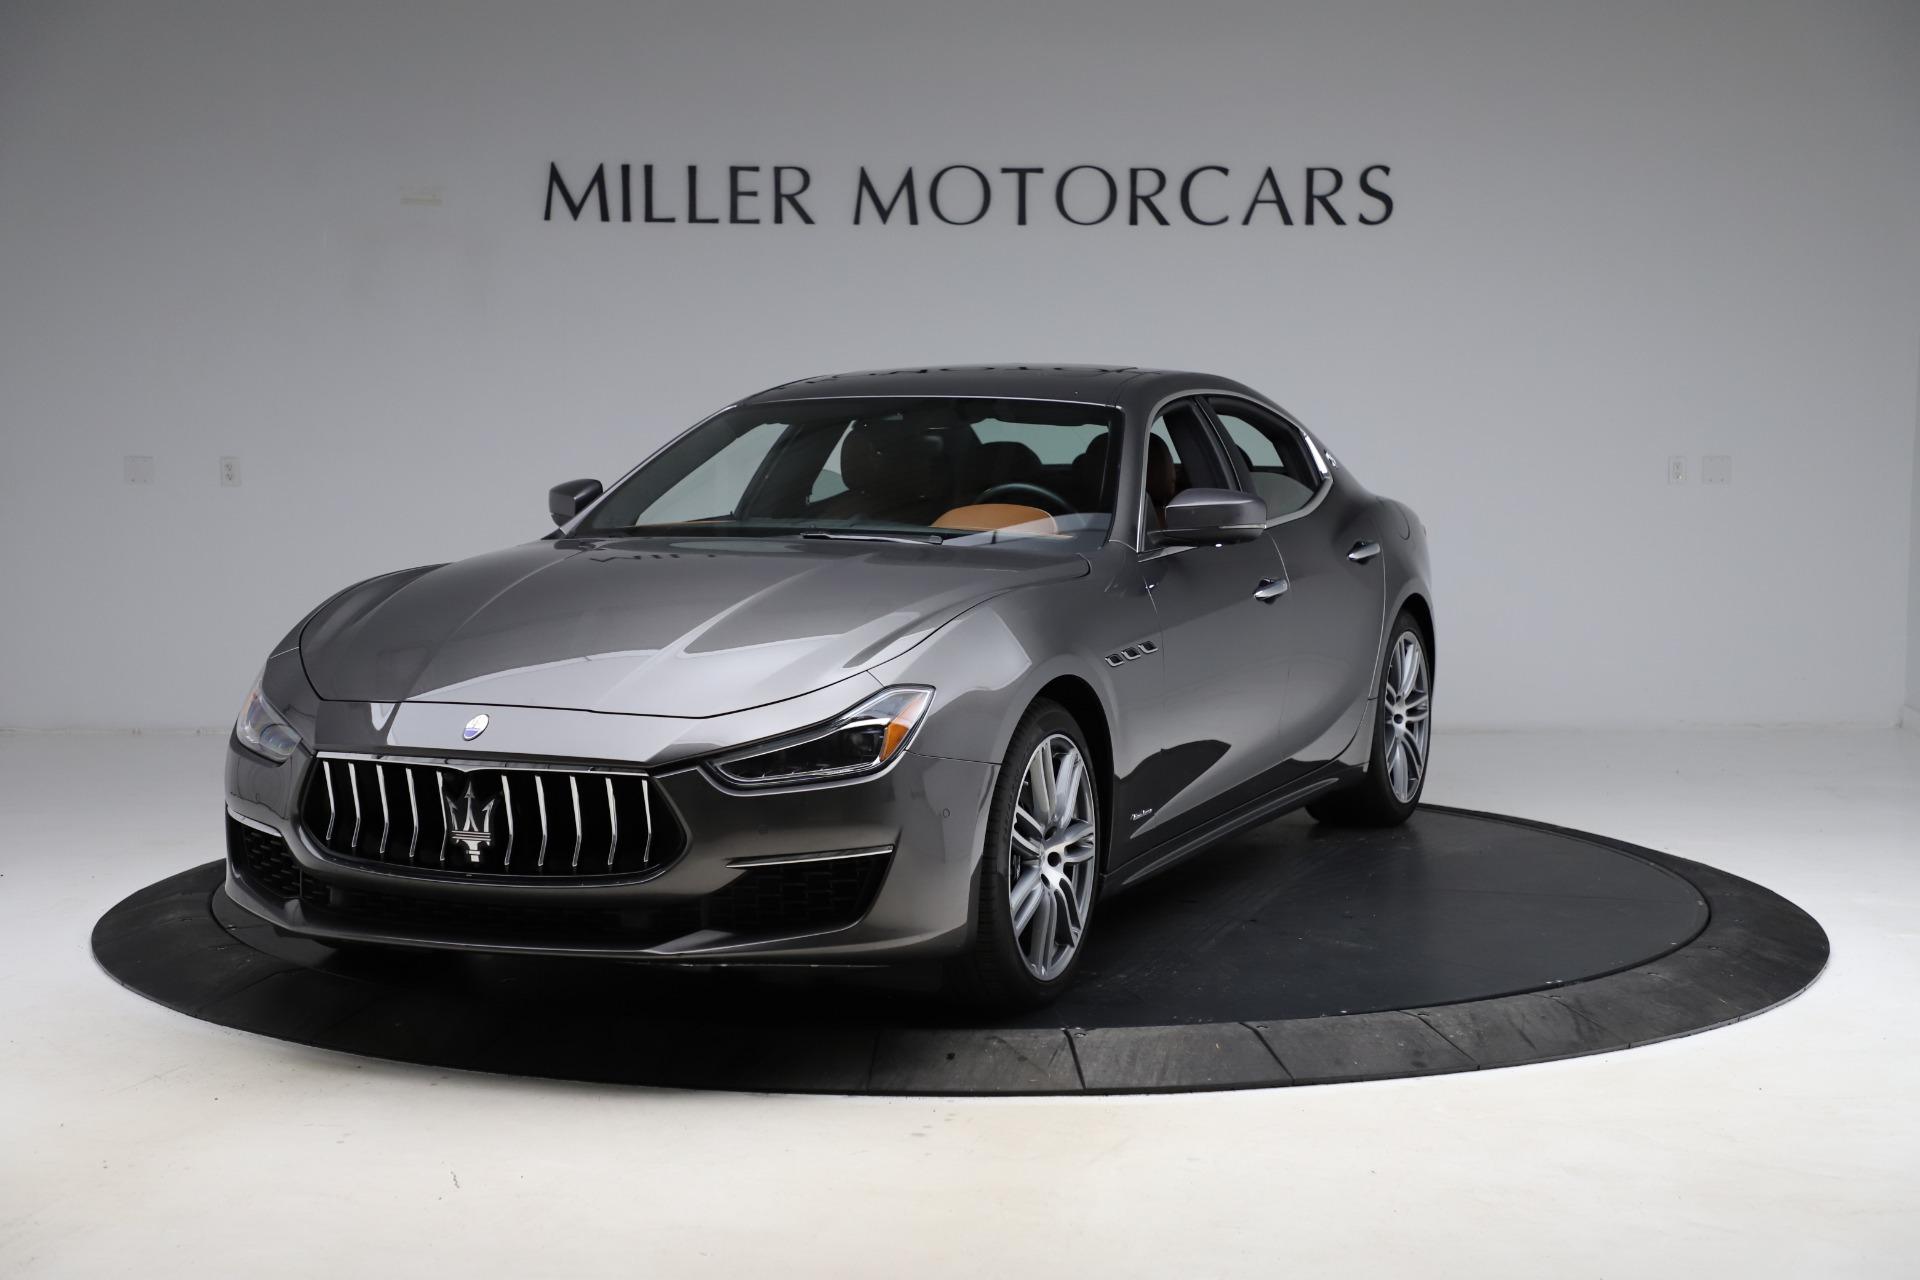 Used 2018 Maserati Ghibli SQ4 GranLusso for sale $51,900 at Bentley Greenwich in Greenwich CT 06830 1